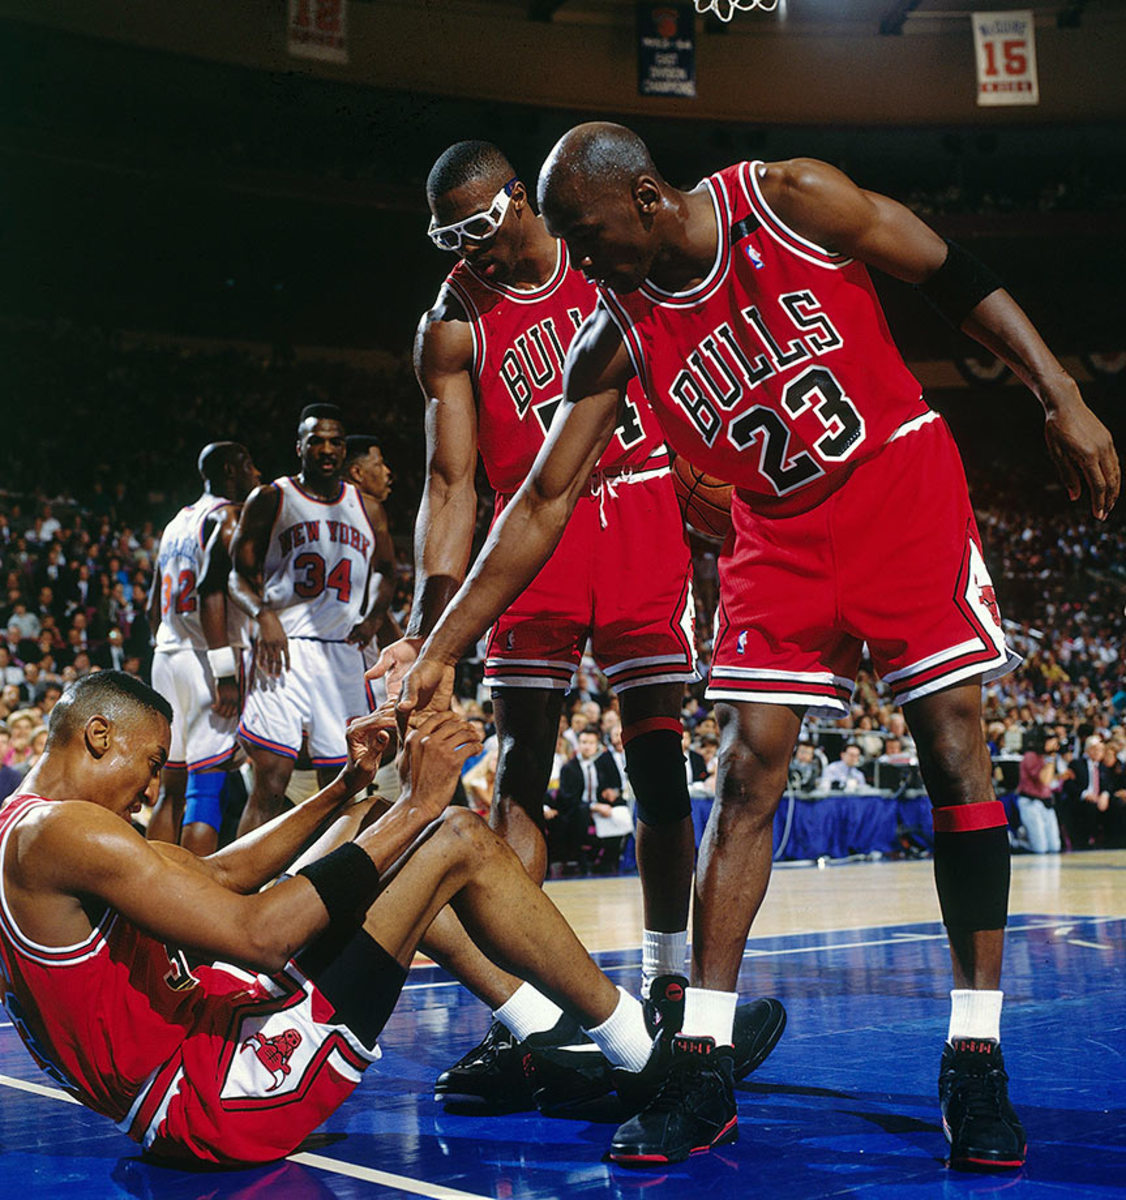 1992-0514-Scottie-Pippen-Michael-Jordan-Horace-Grant-005057977_0.jpg